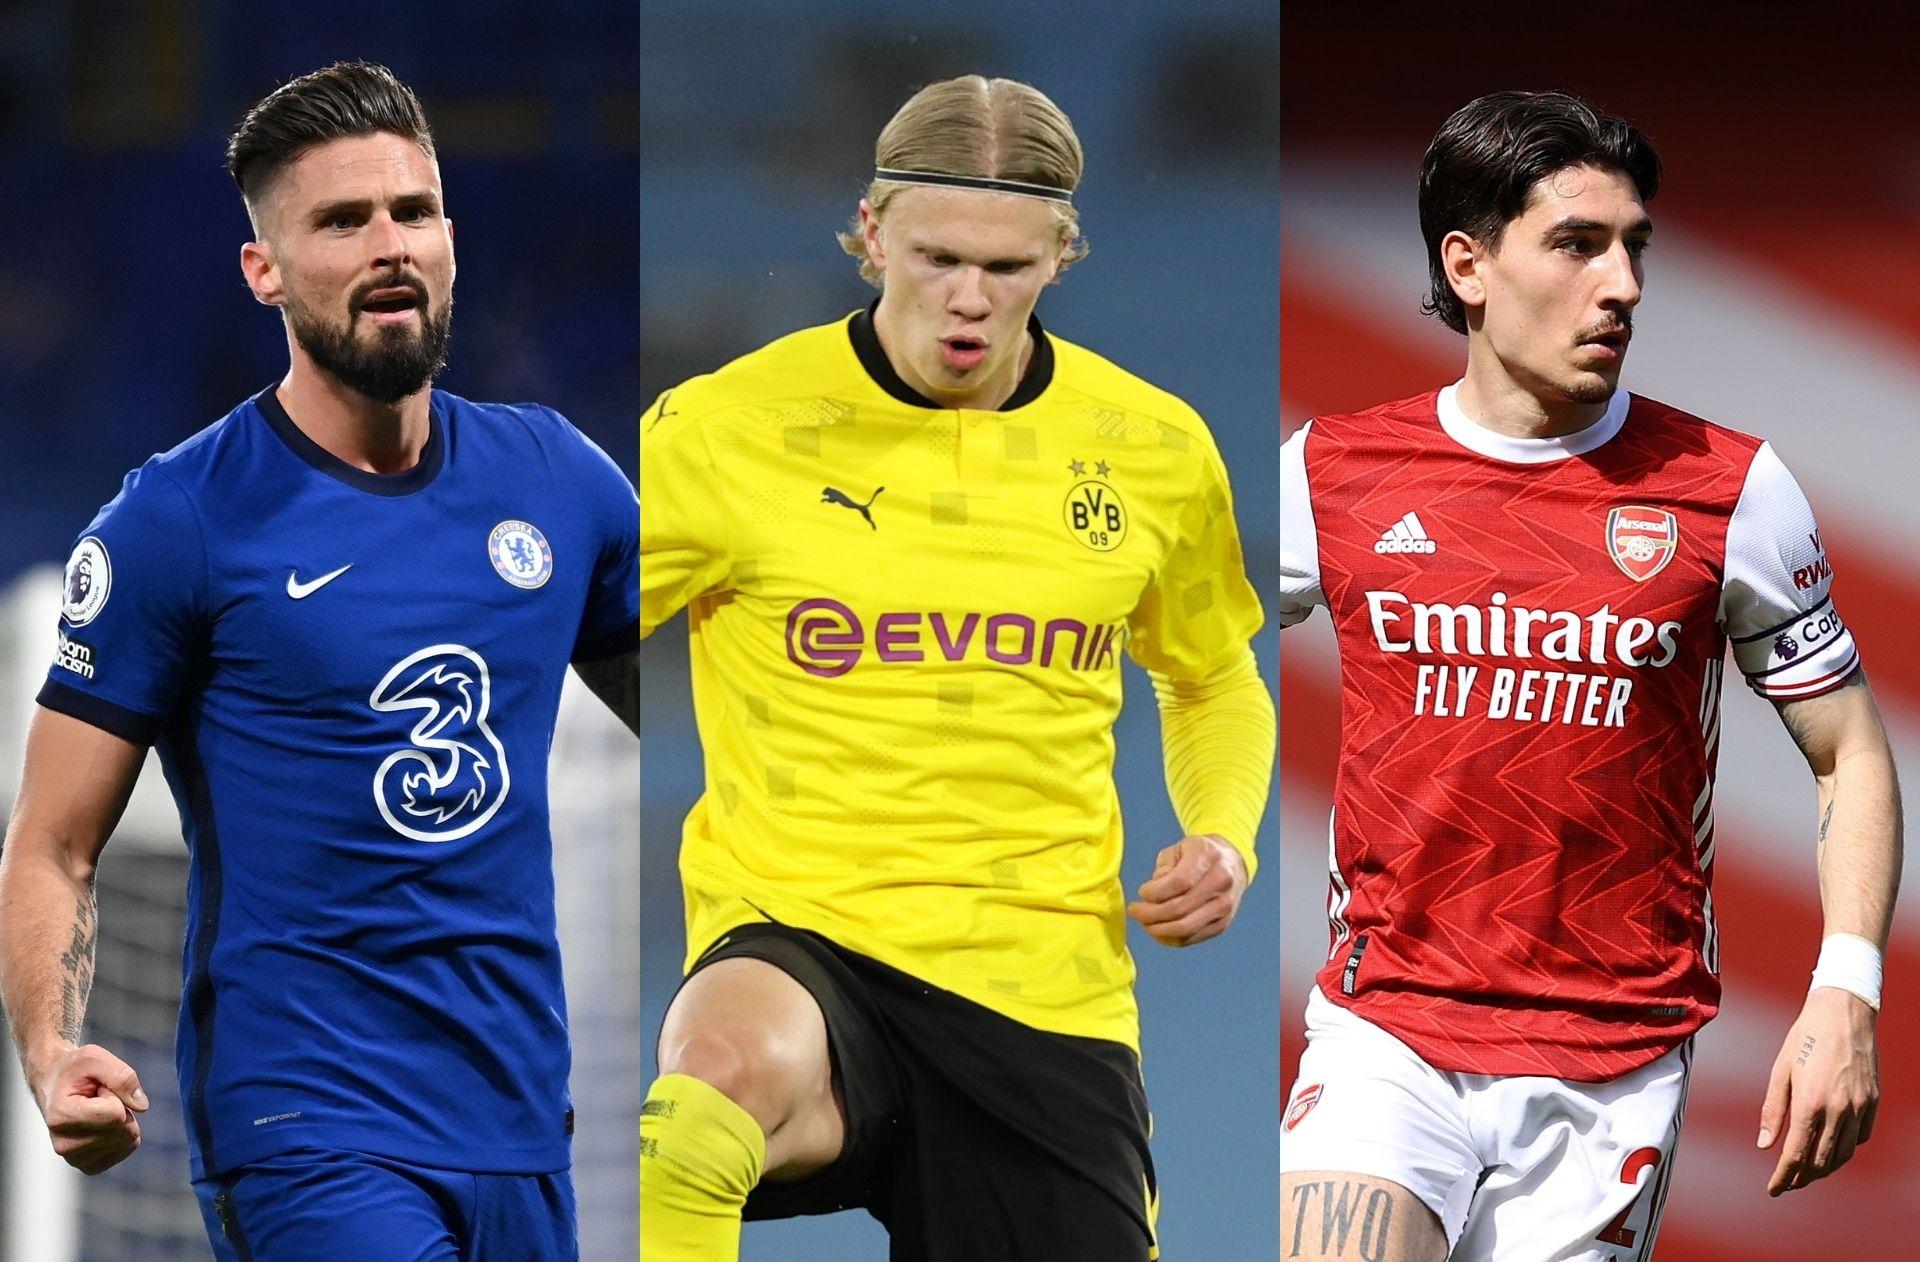 Giroud - Chelsea, Haaland - Dortmund, Bellerin - Arsenal